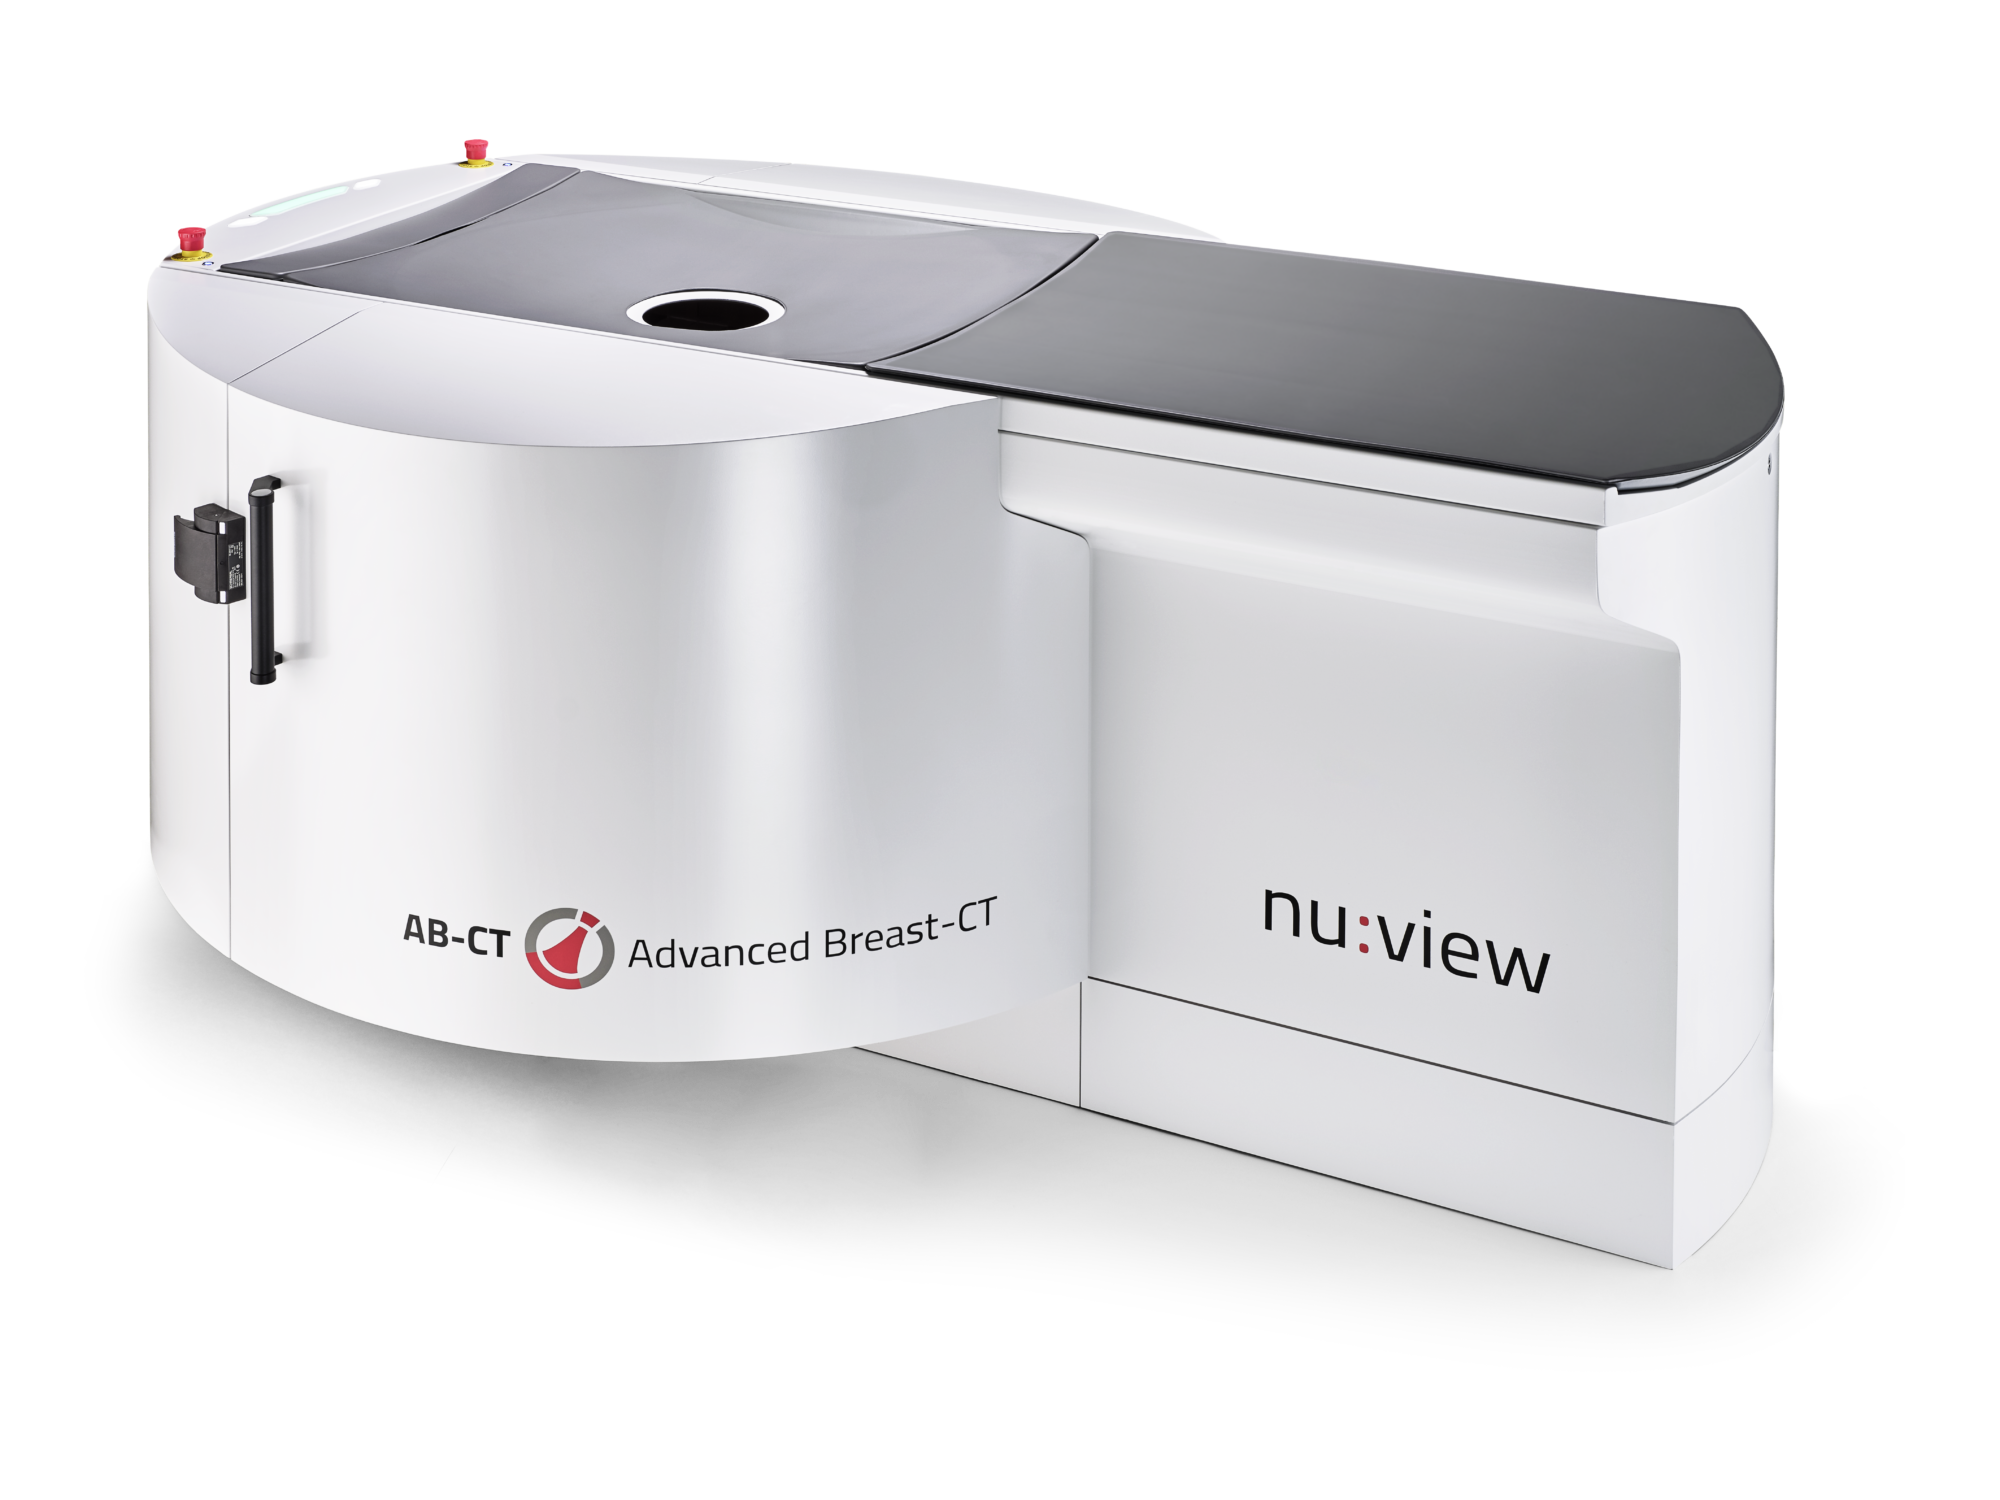 Image of nu:view breast ct scanner